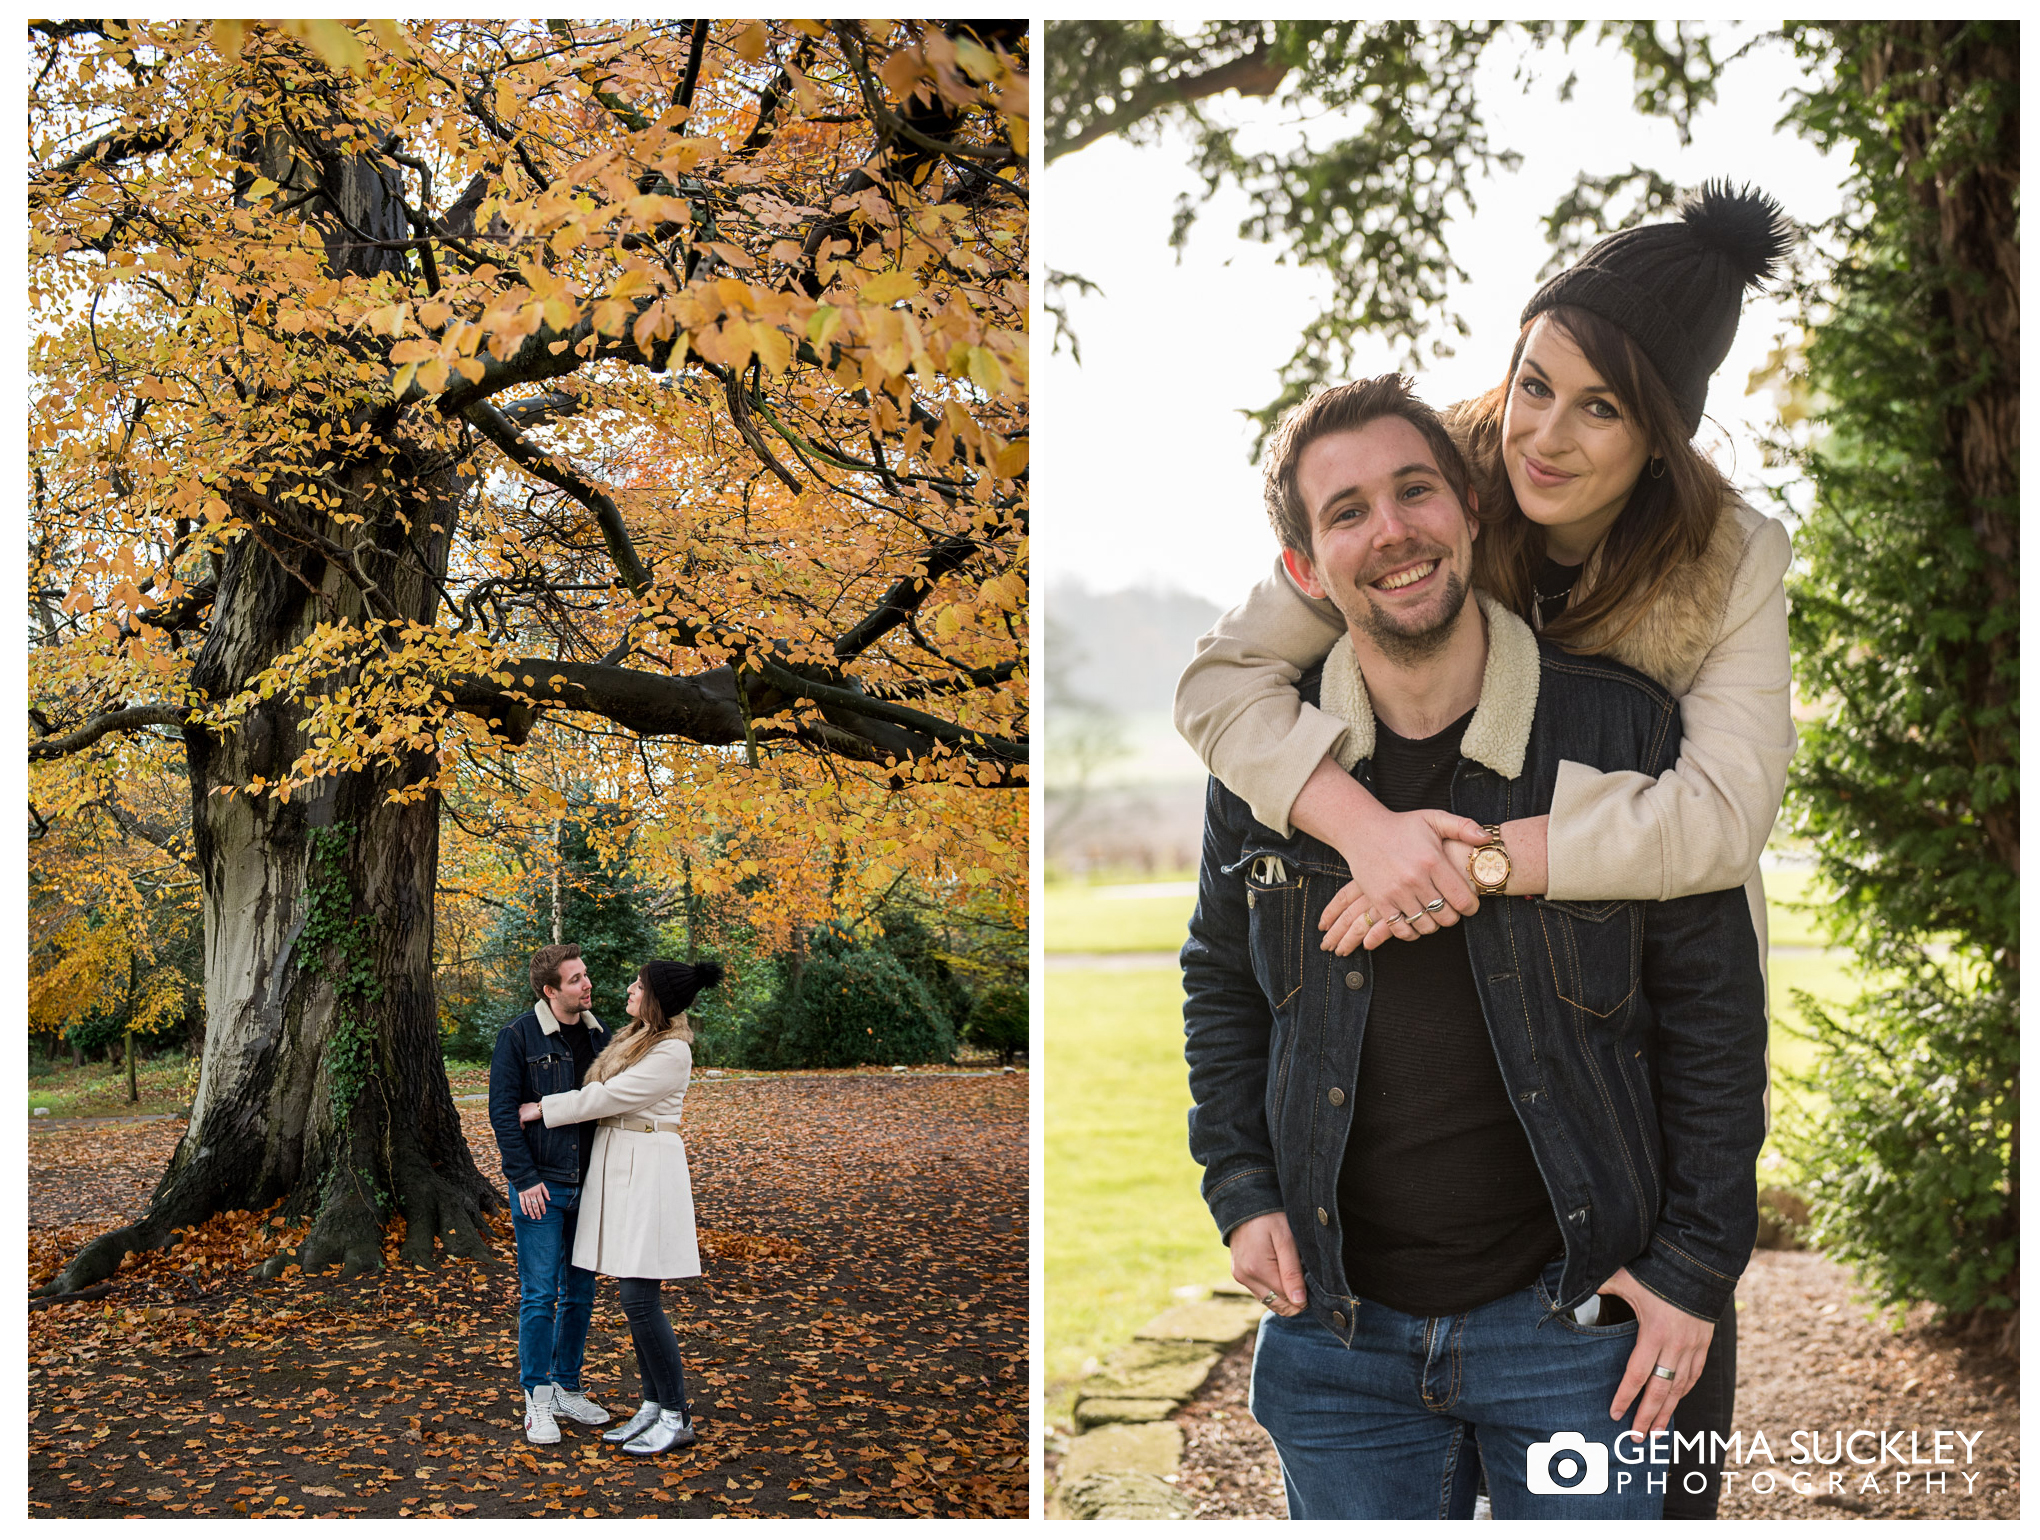 A pre-wedding photo shoot at Hazlewood Castle